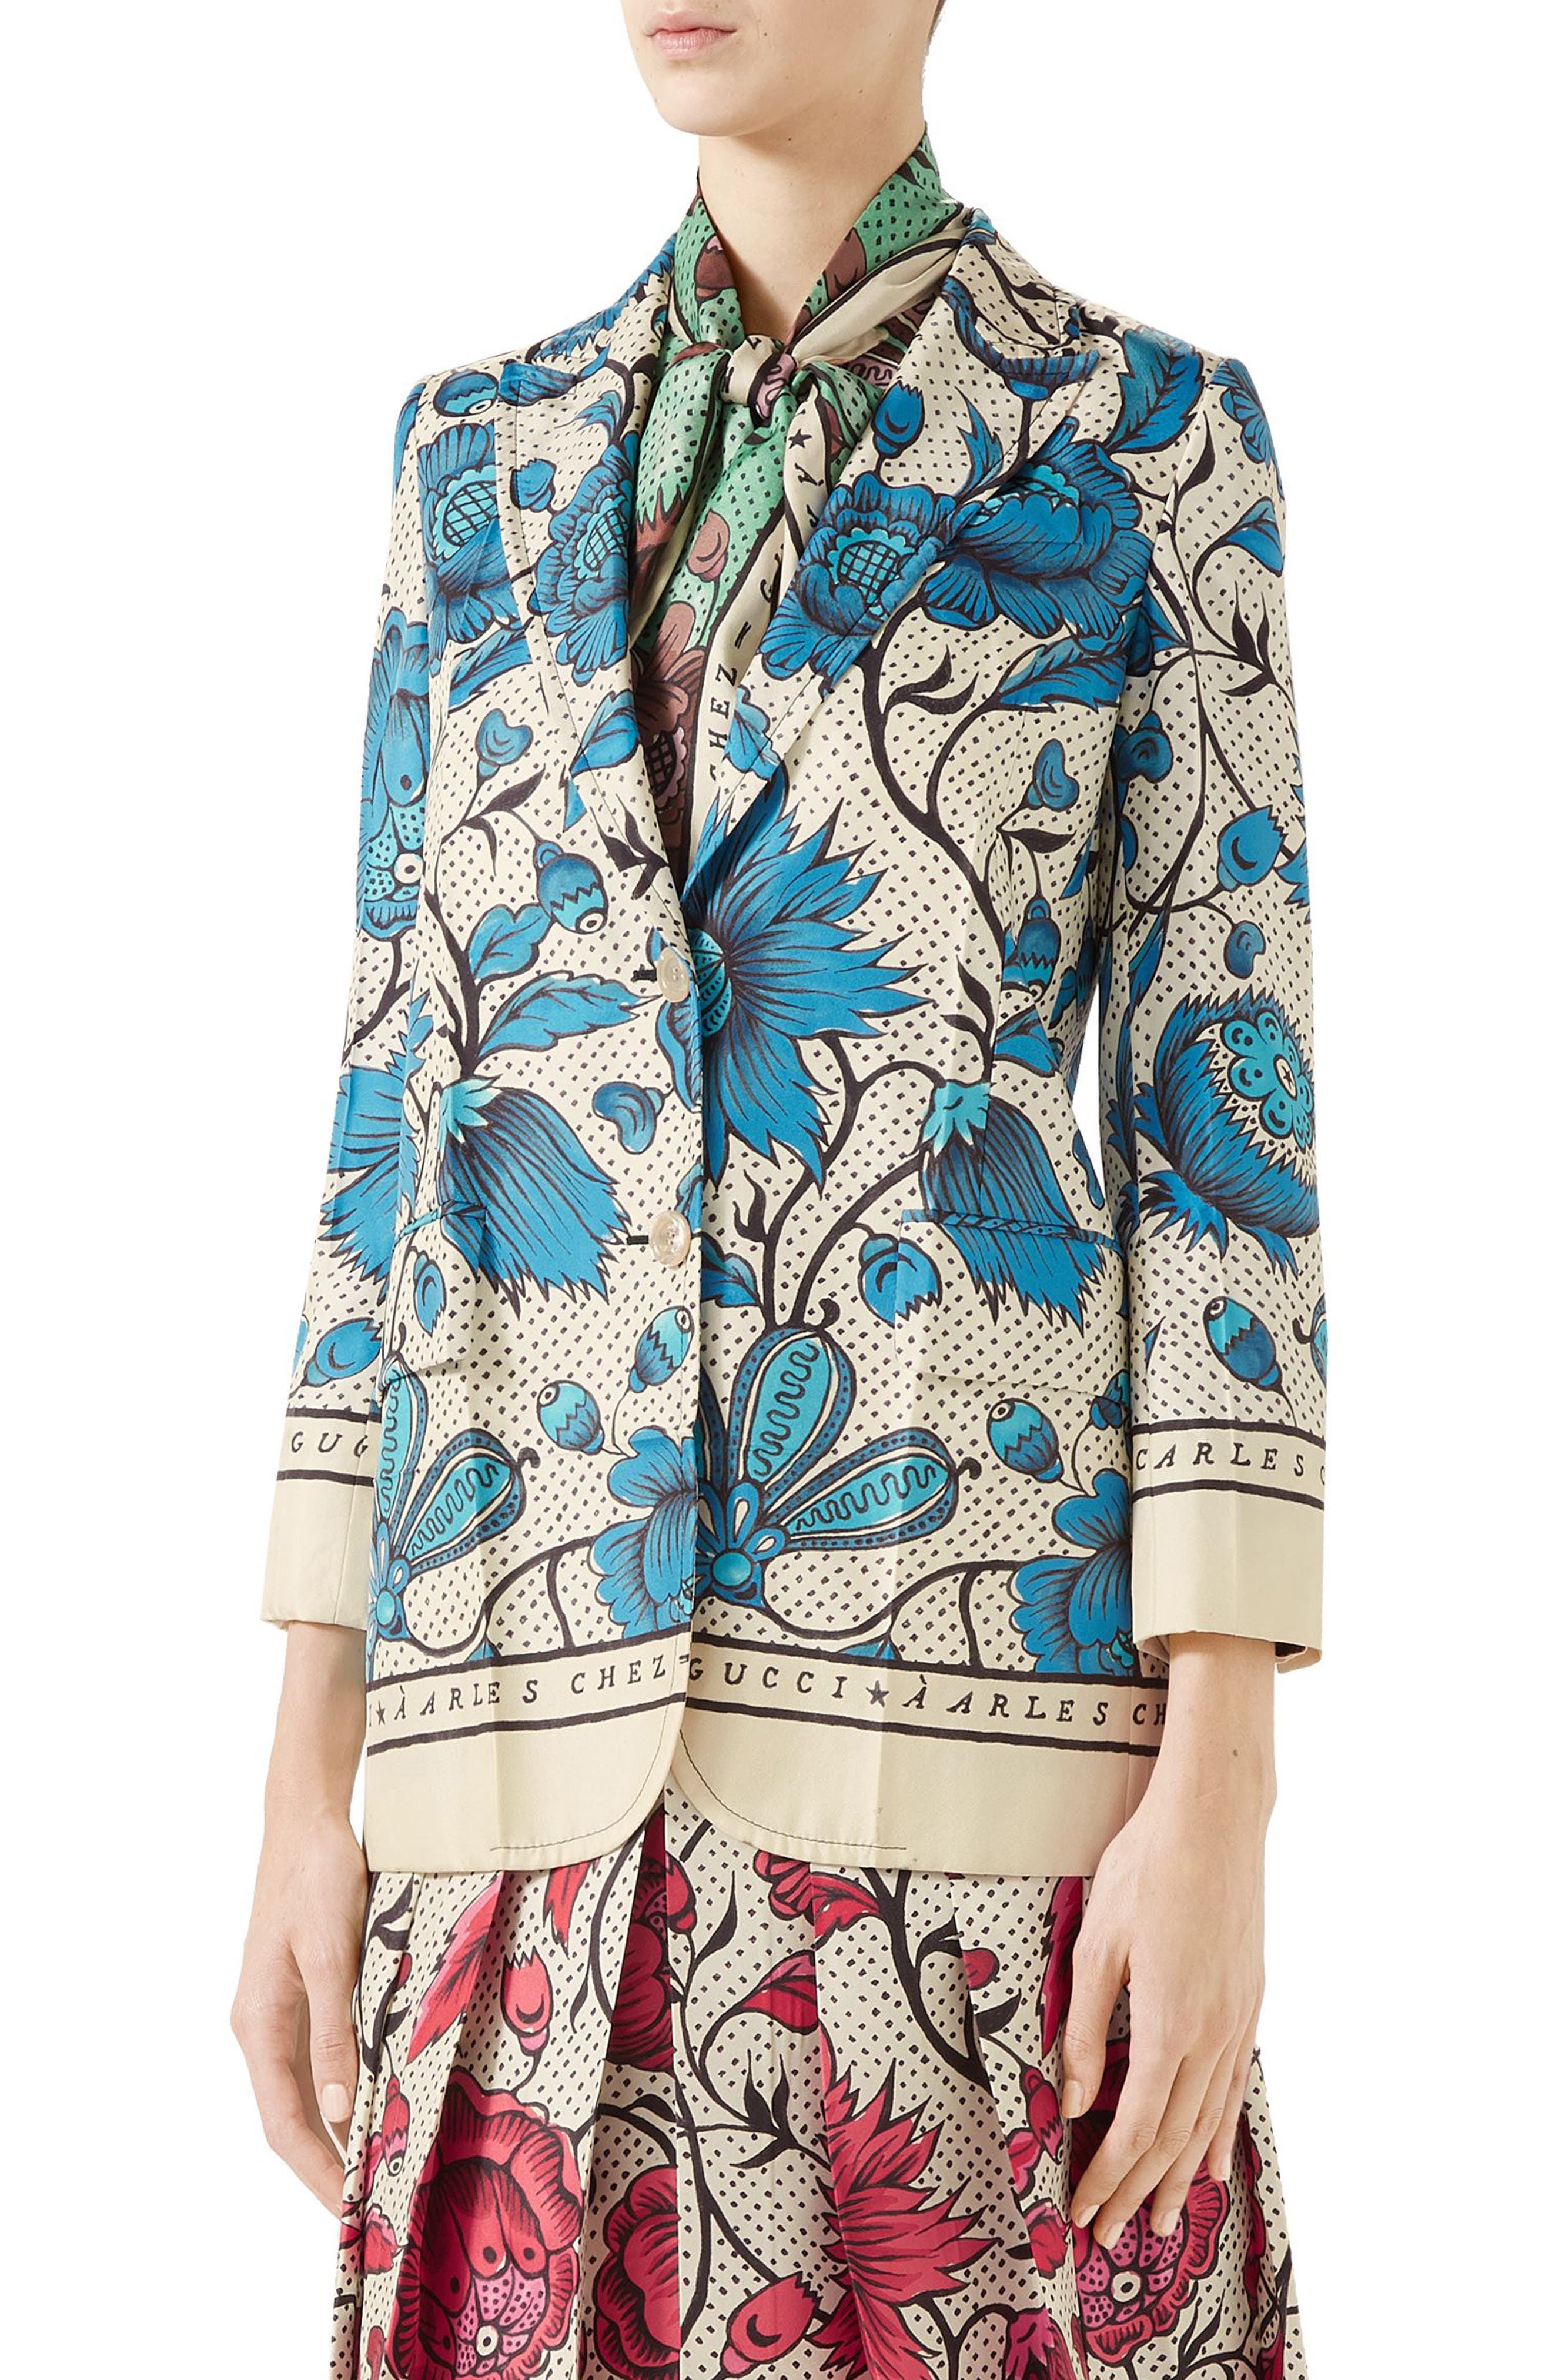 Watercolor Floral Print Silk Jacket,                             Main thumbnail 1, color,                             4821 BLUE/ IVORY PRT/ MC